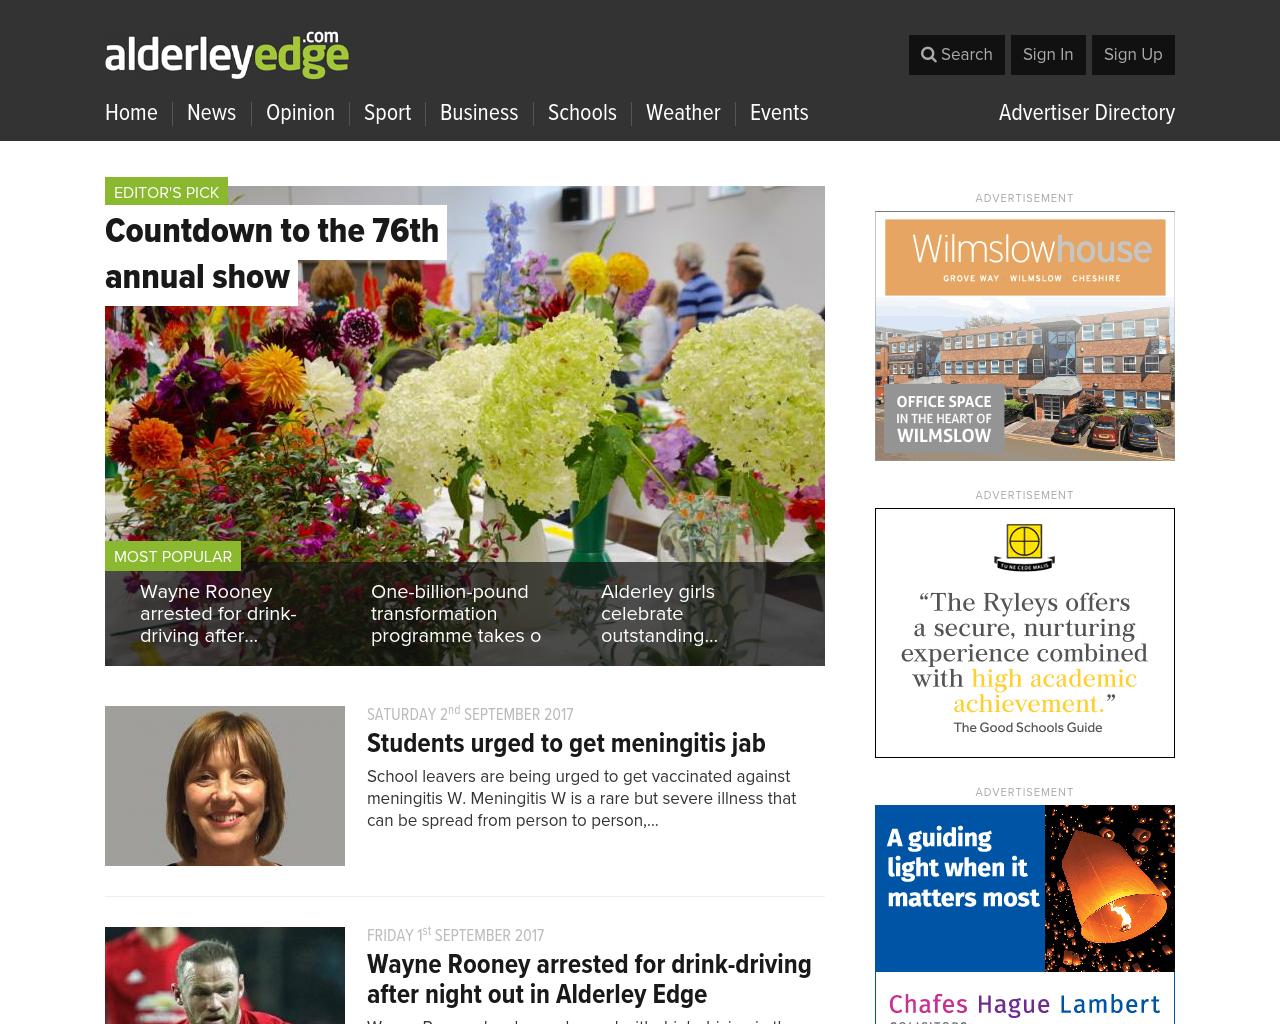 alderleyedge.com-Advertising-Reviews-Pricing